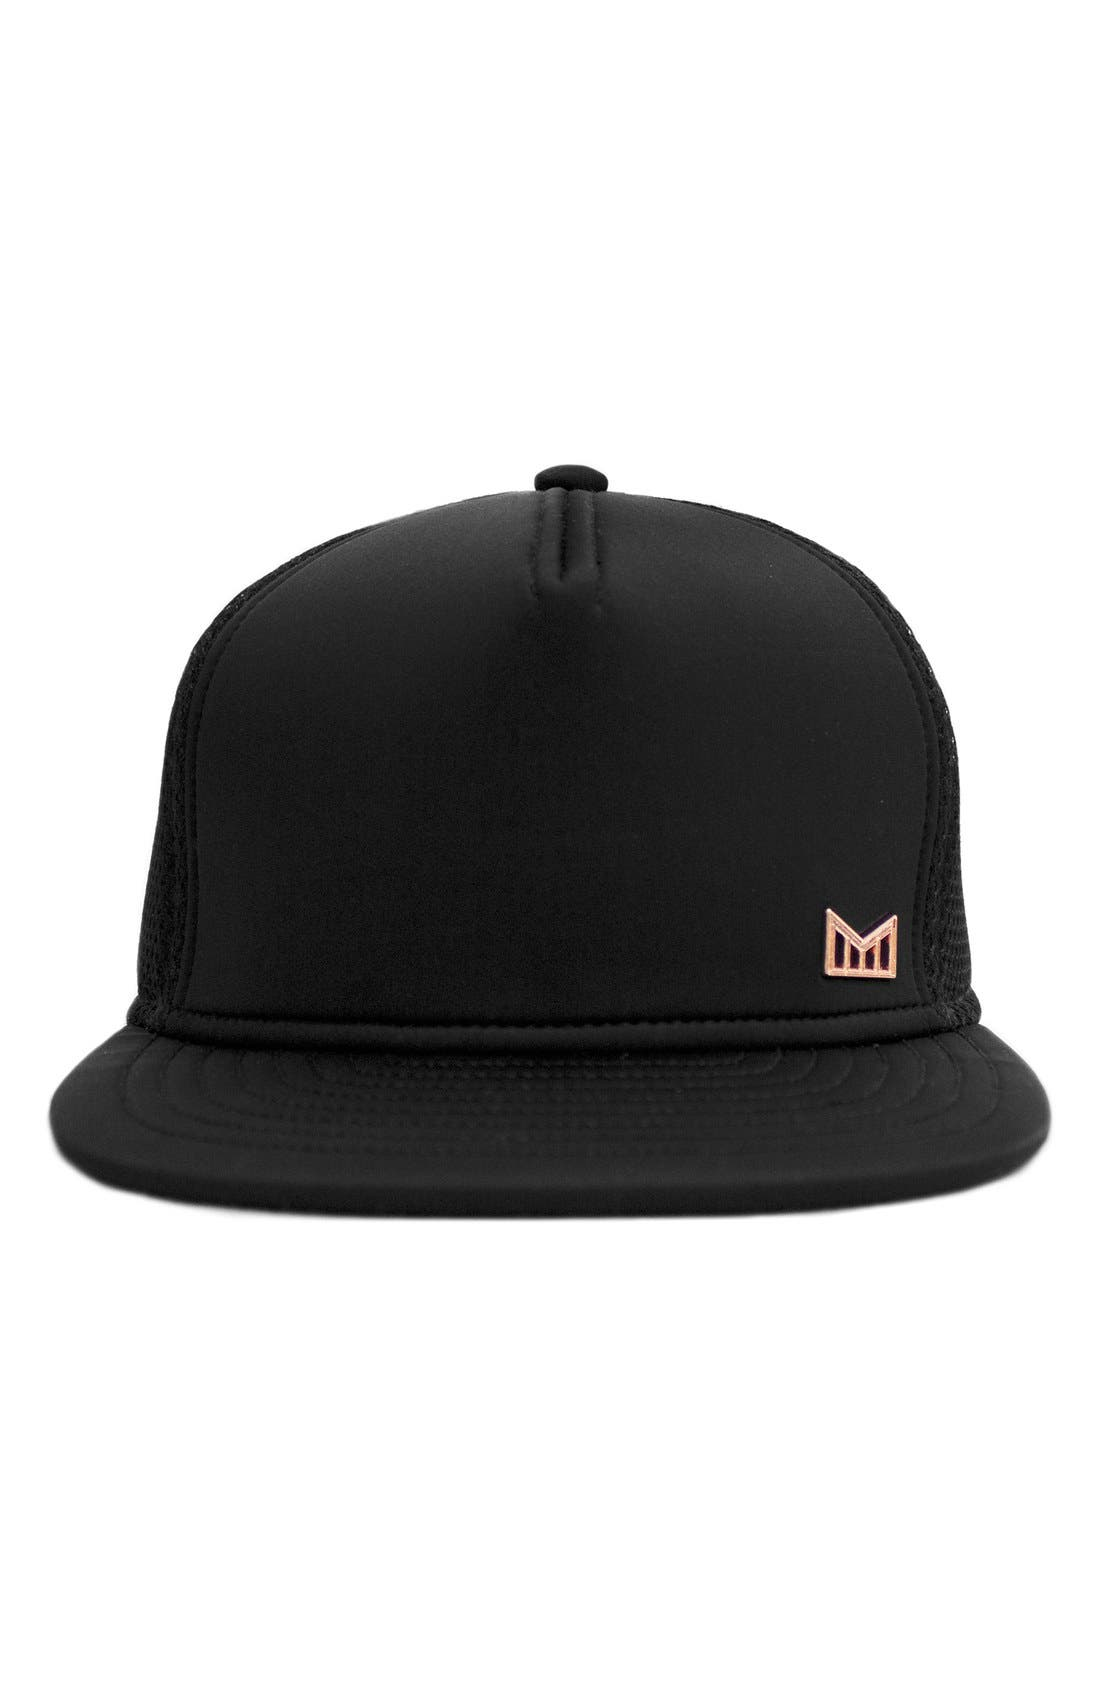 'The Majesty' Mesh Back Snapback Hat,                             Alternate thumbnail 5, color,                             Black